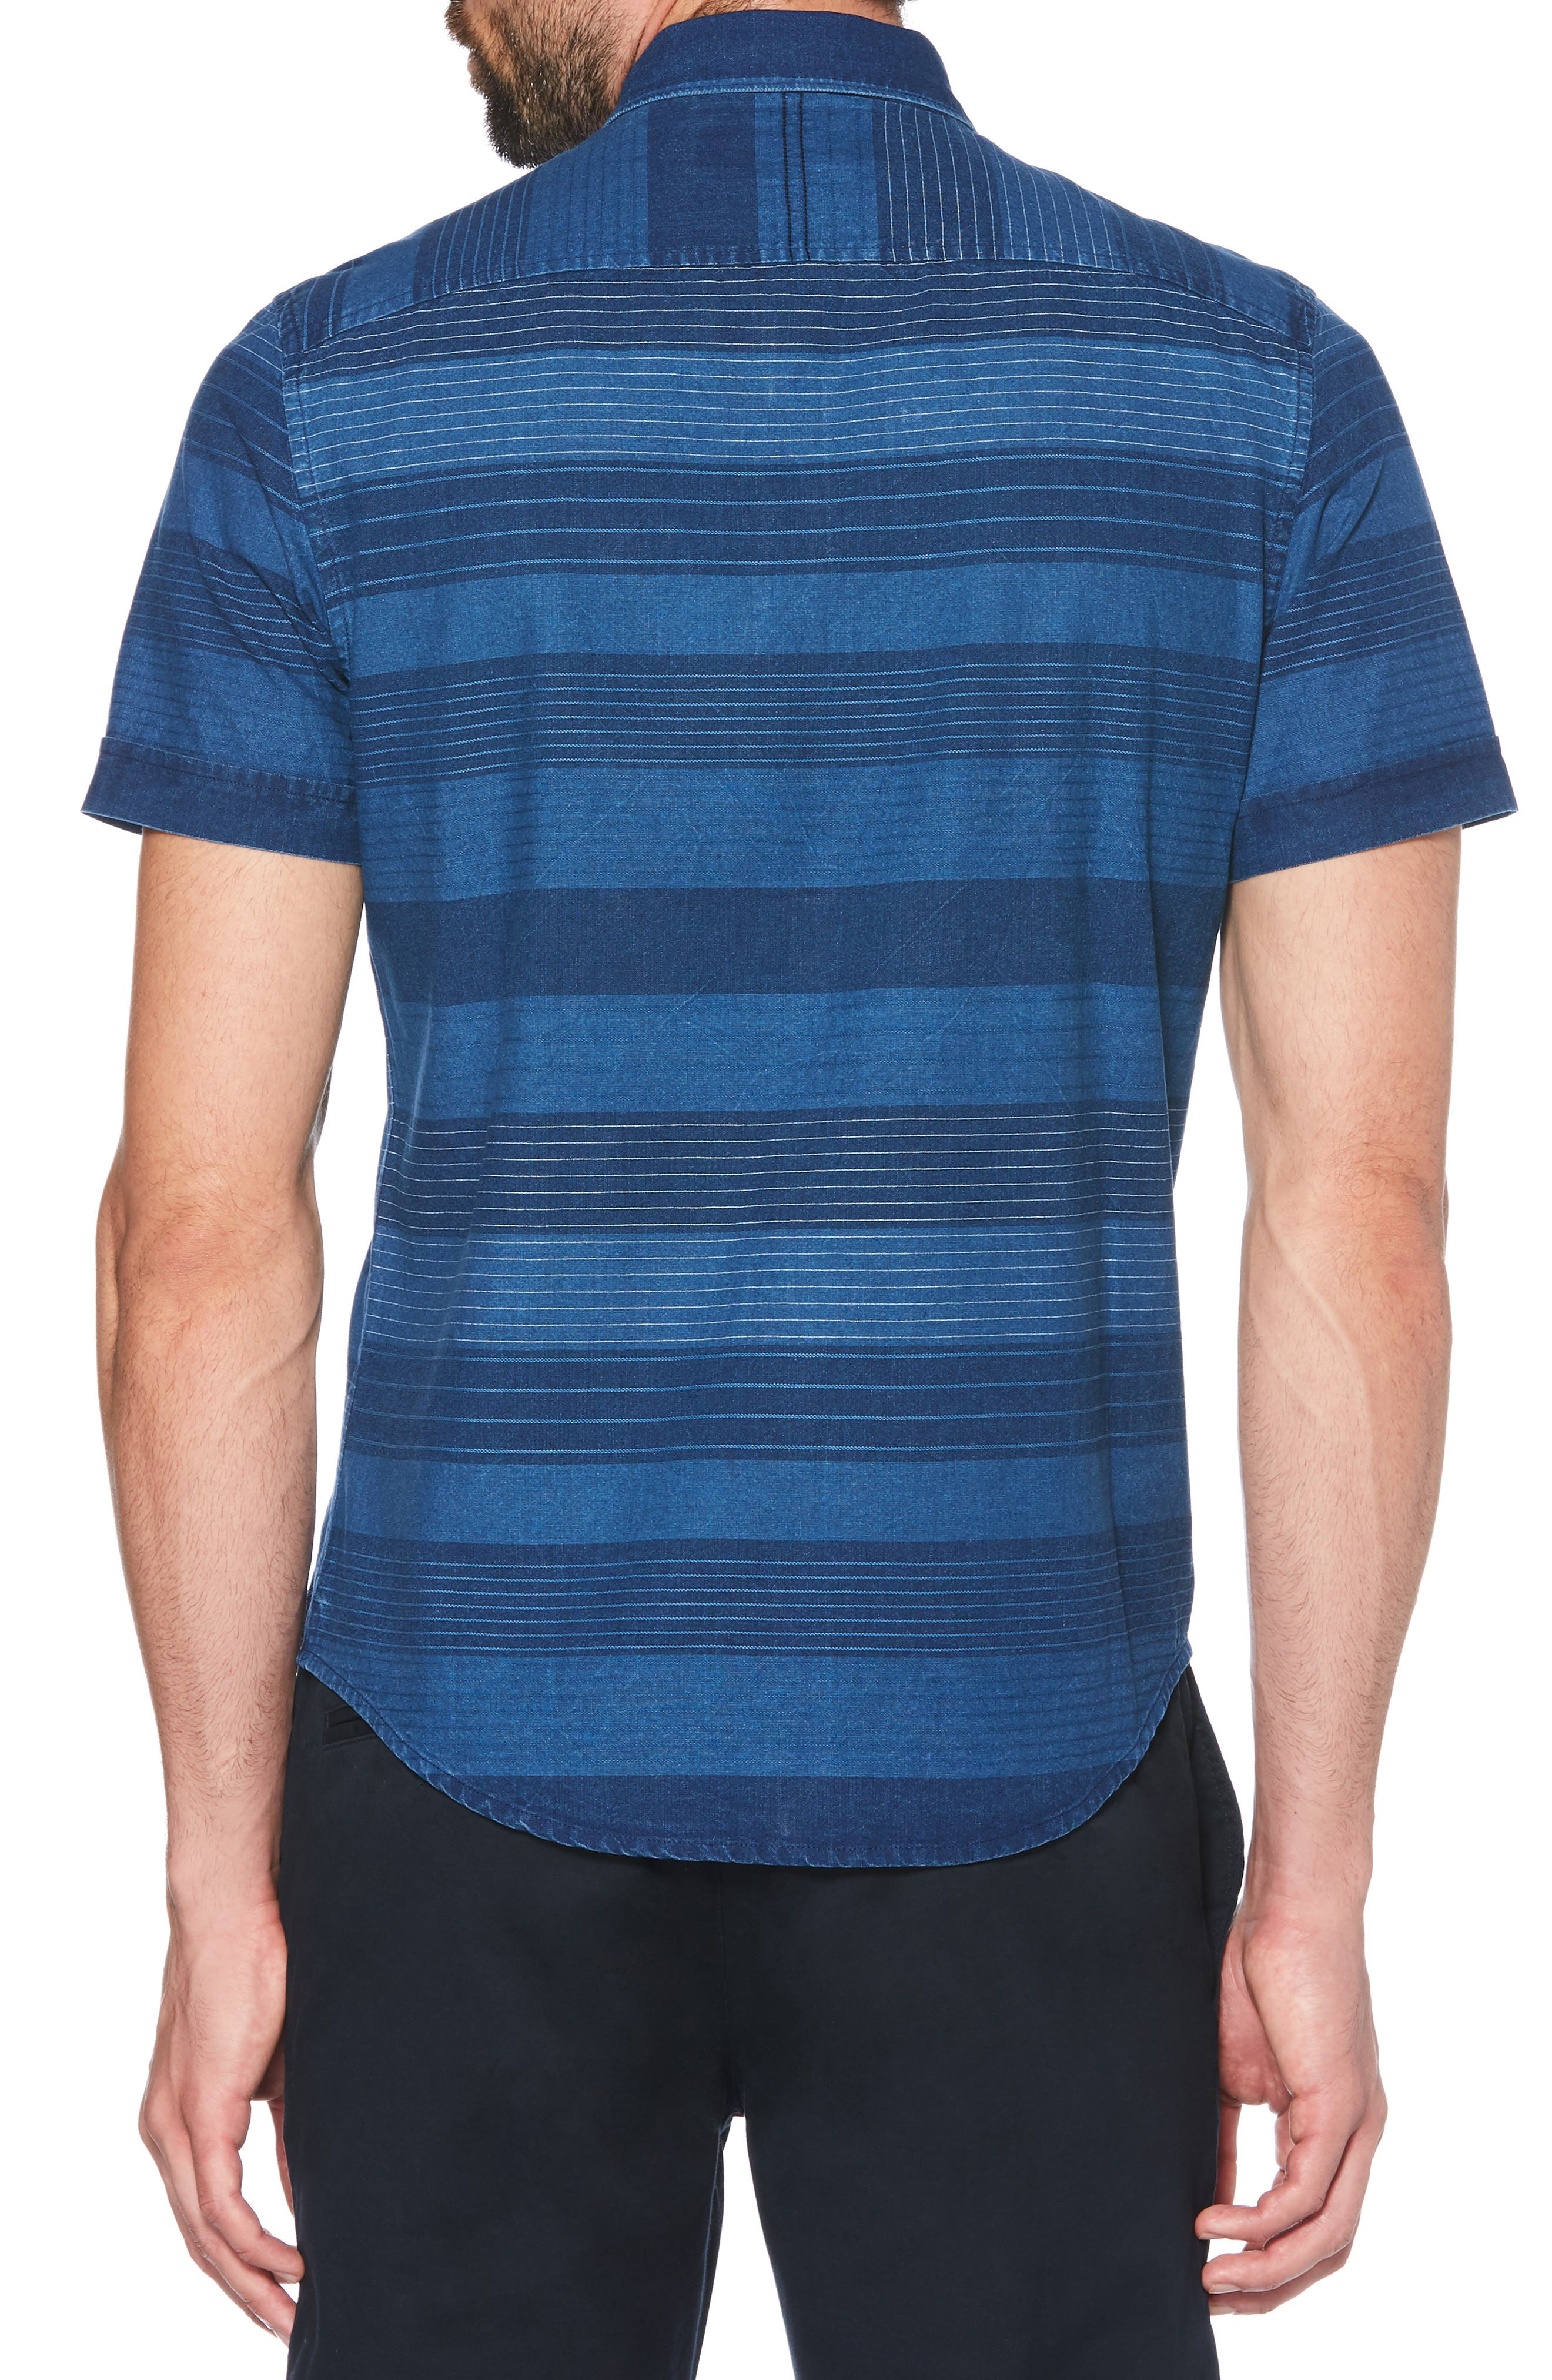 ORIGINAL PENGUIN, Slim Fit Dobby Striped Sport Shirt, Alternate thumbnail 3, color, DARK DENIM